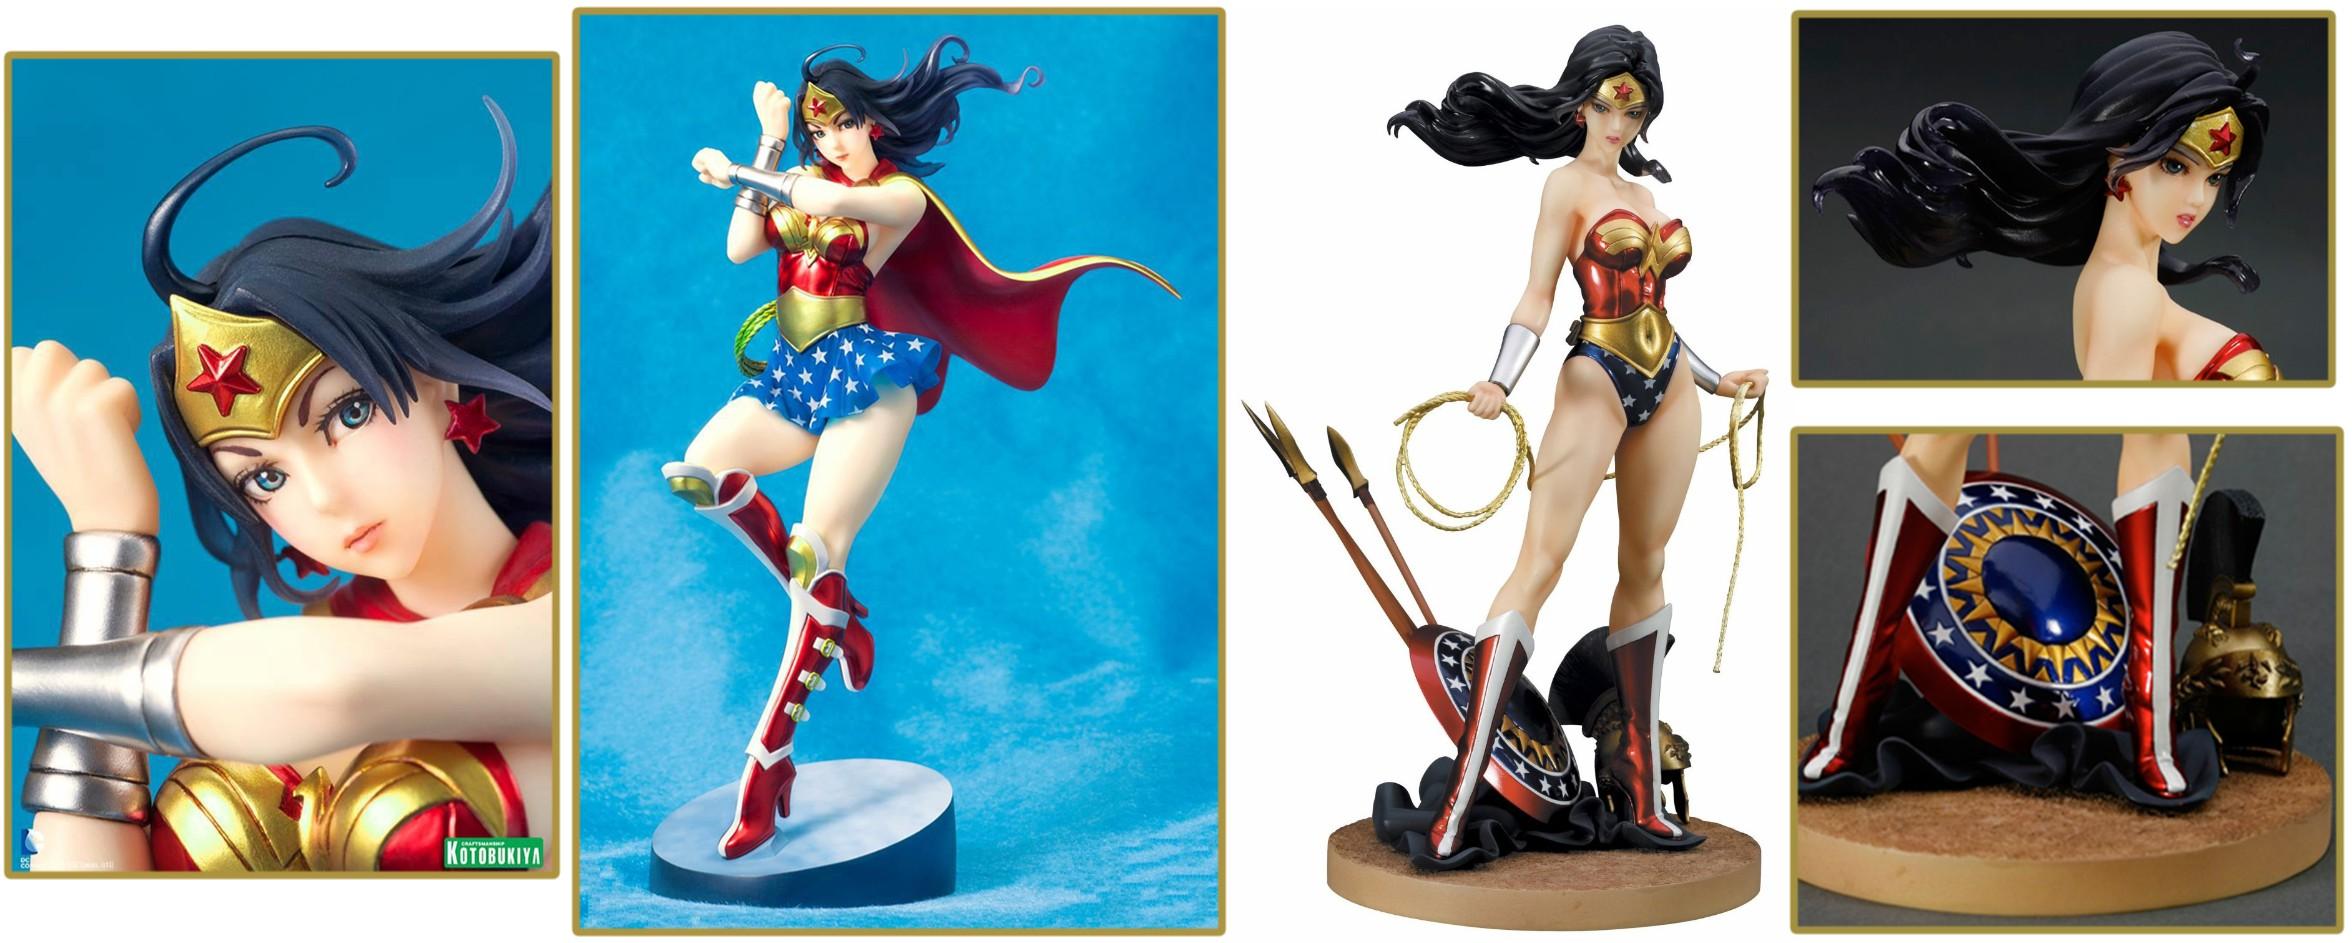 Kotobukiya – DC Comics Bishoujo: Wonder Woman Statues